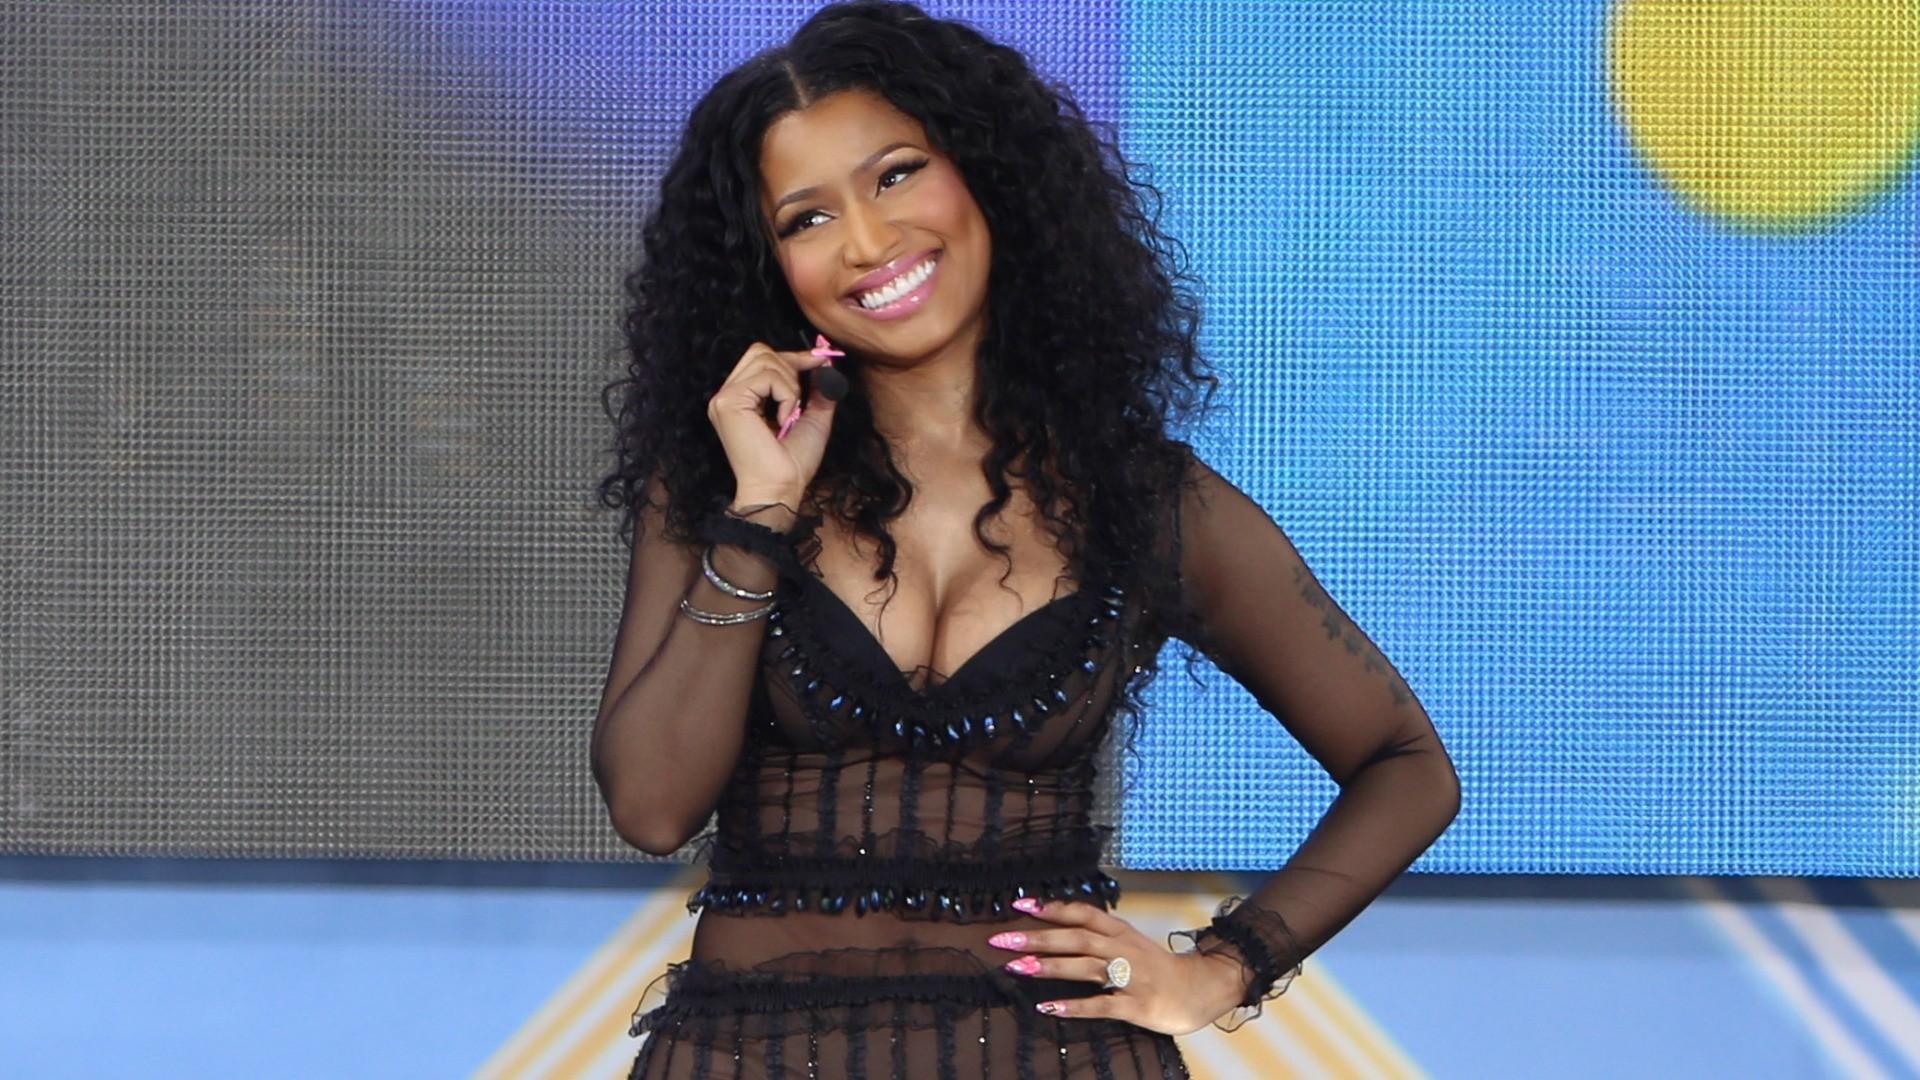 Res: 1920x1080, Nicki Minaj Wallpapers HD